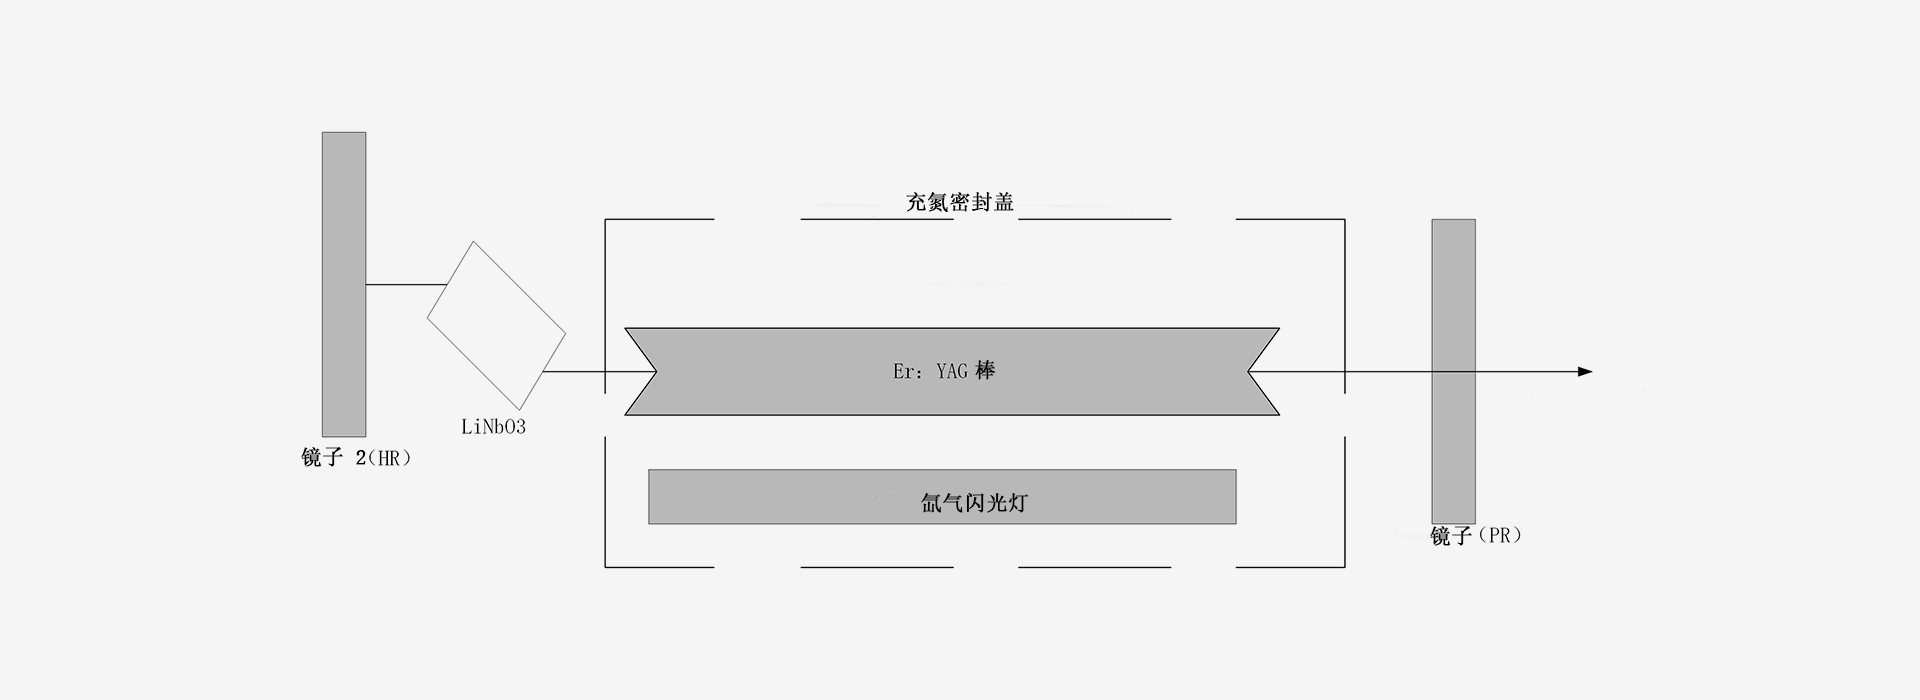 2940nm-激光器原理图-南京光宝-CRYLINK -原理图